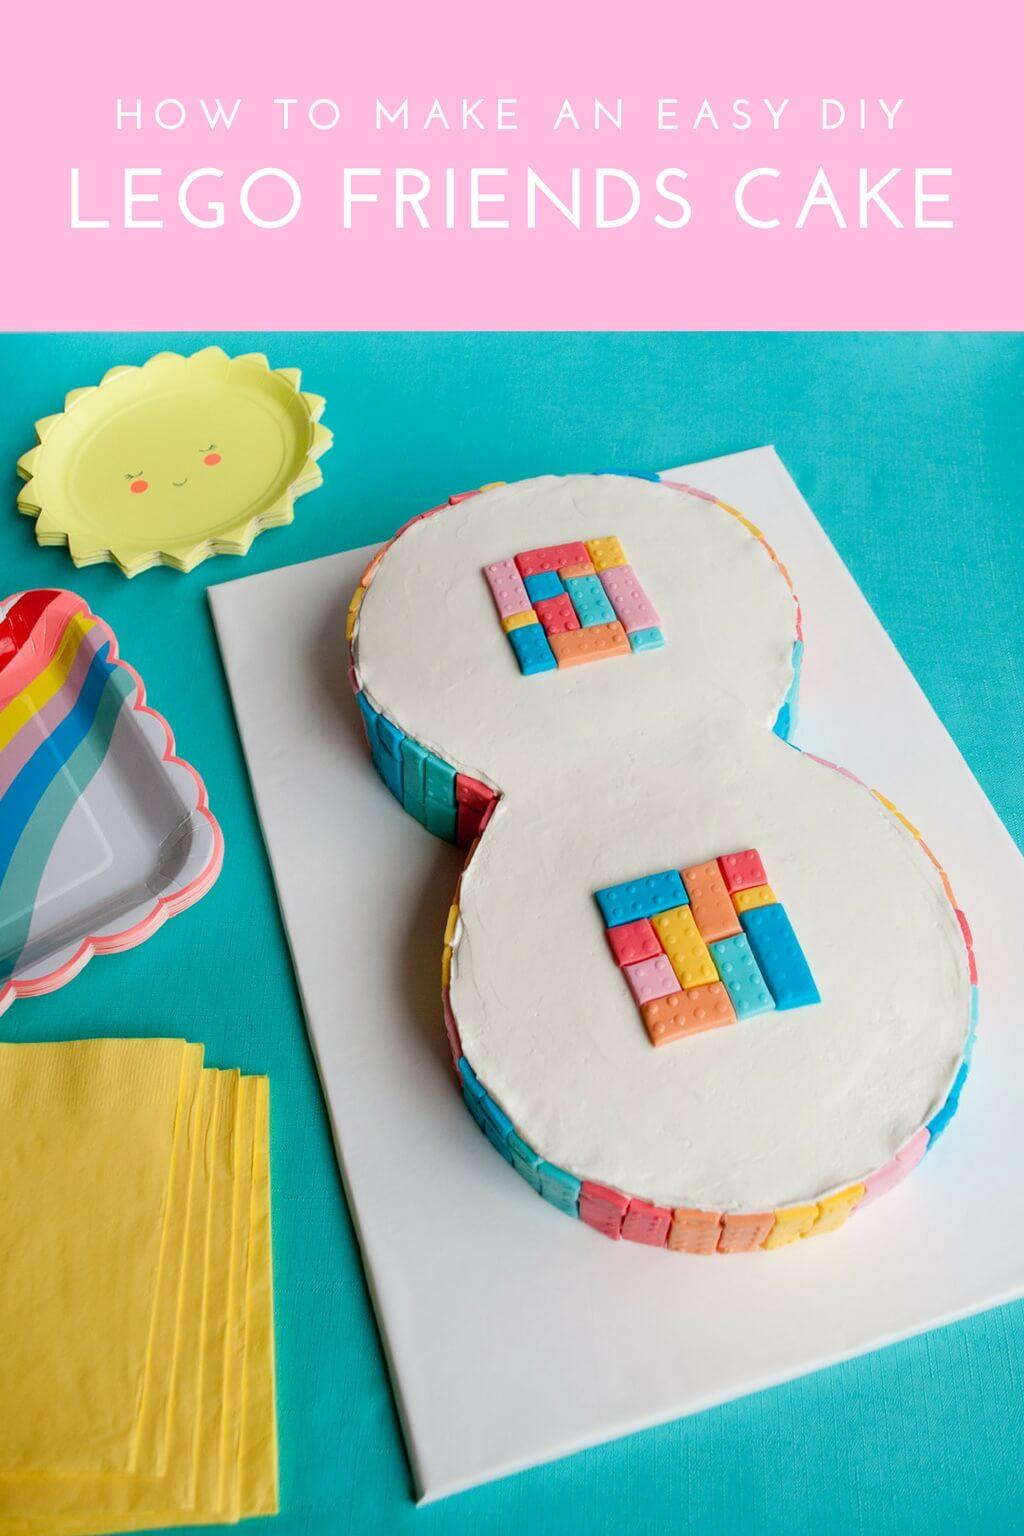 Easy Lego Friends Cake Idea For Girls